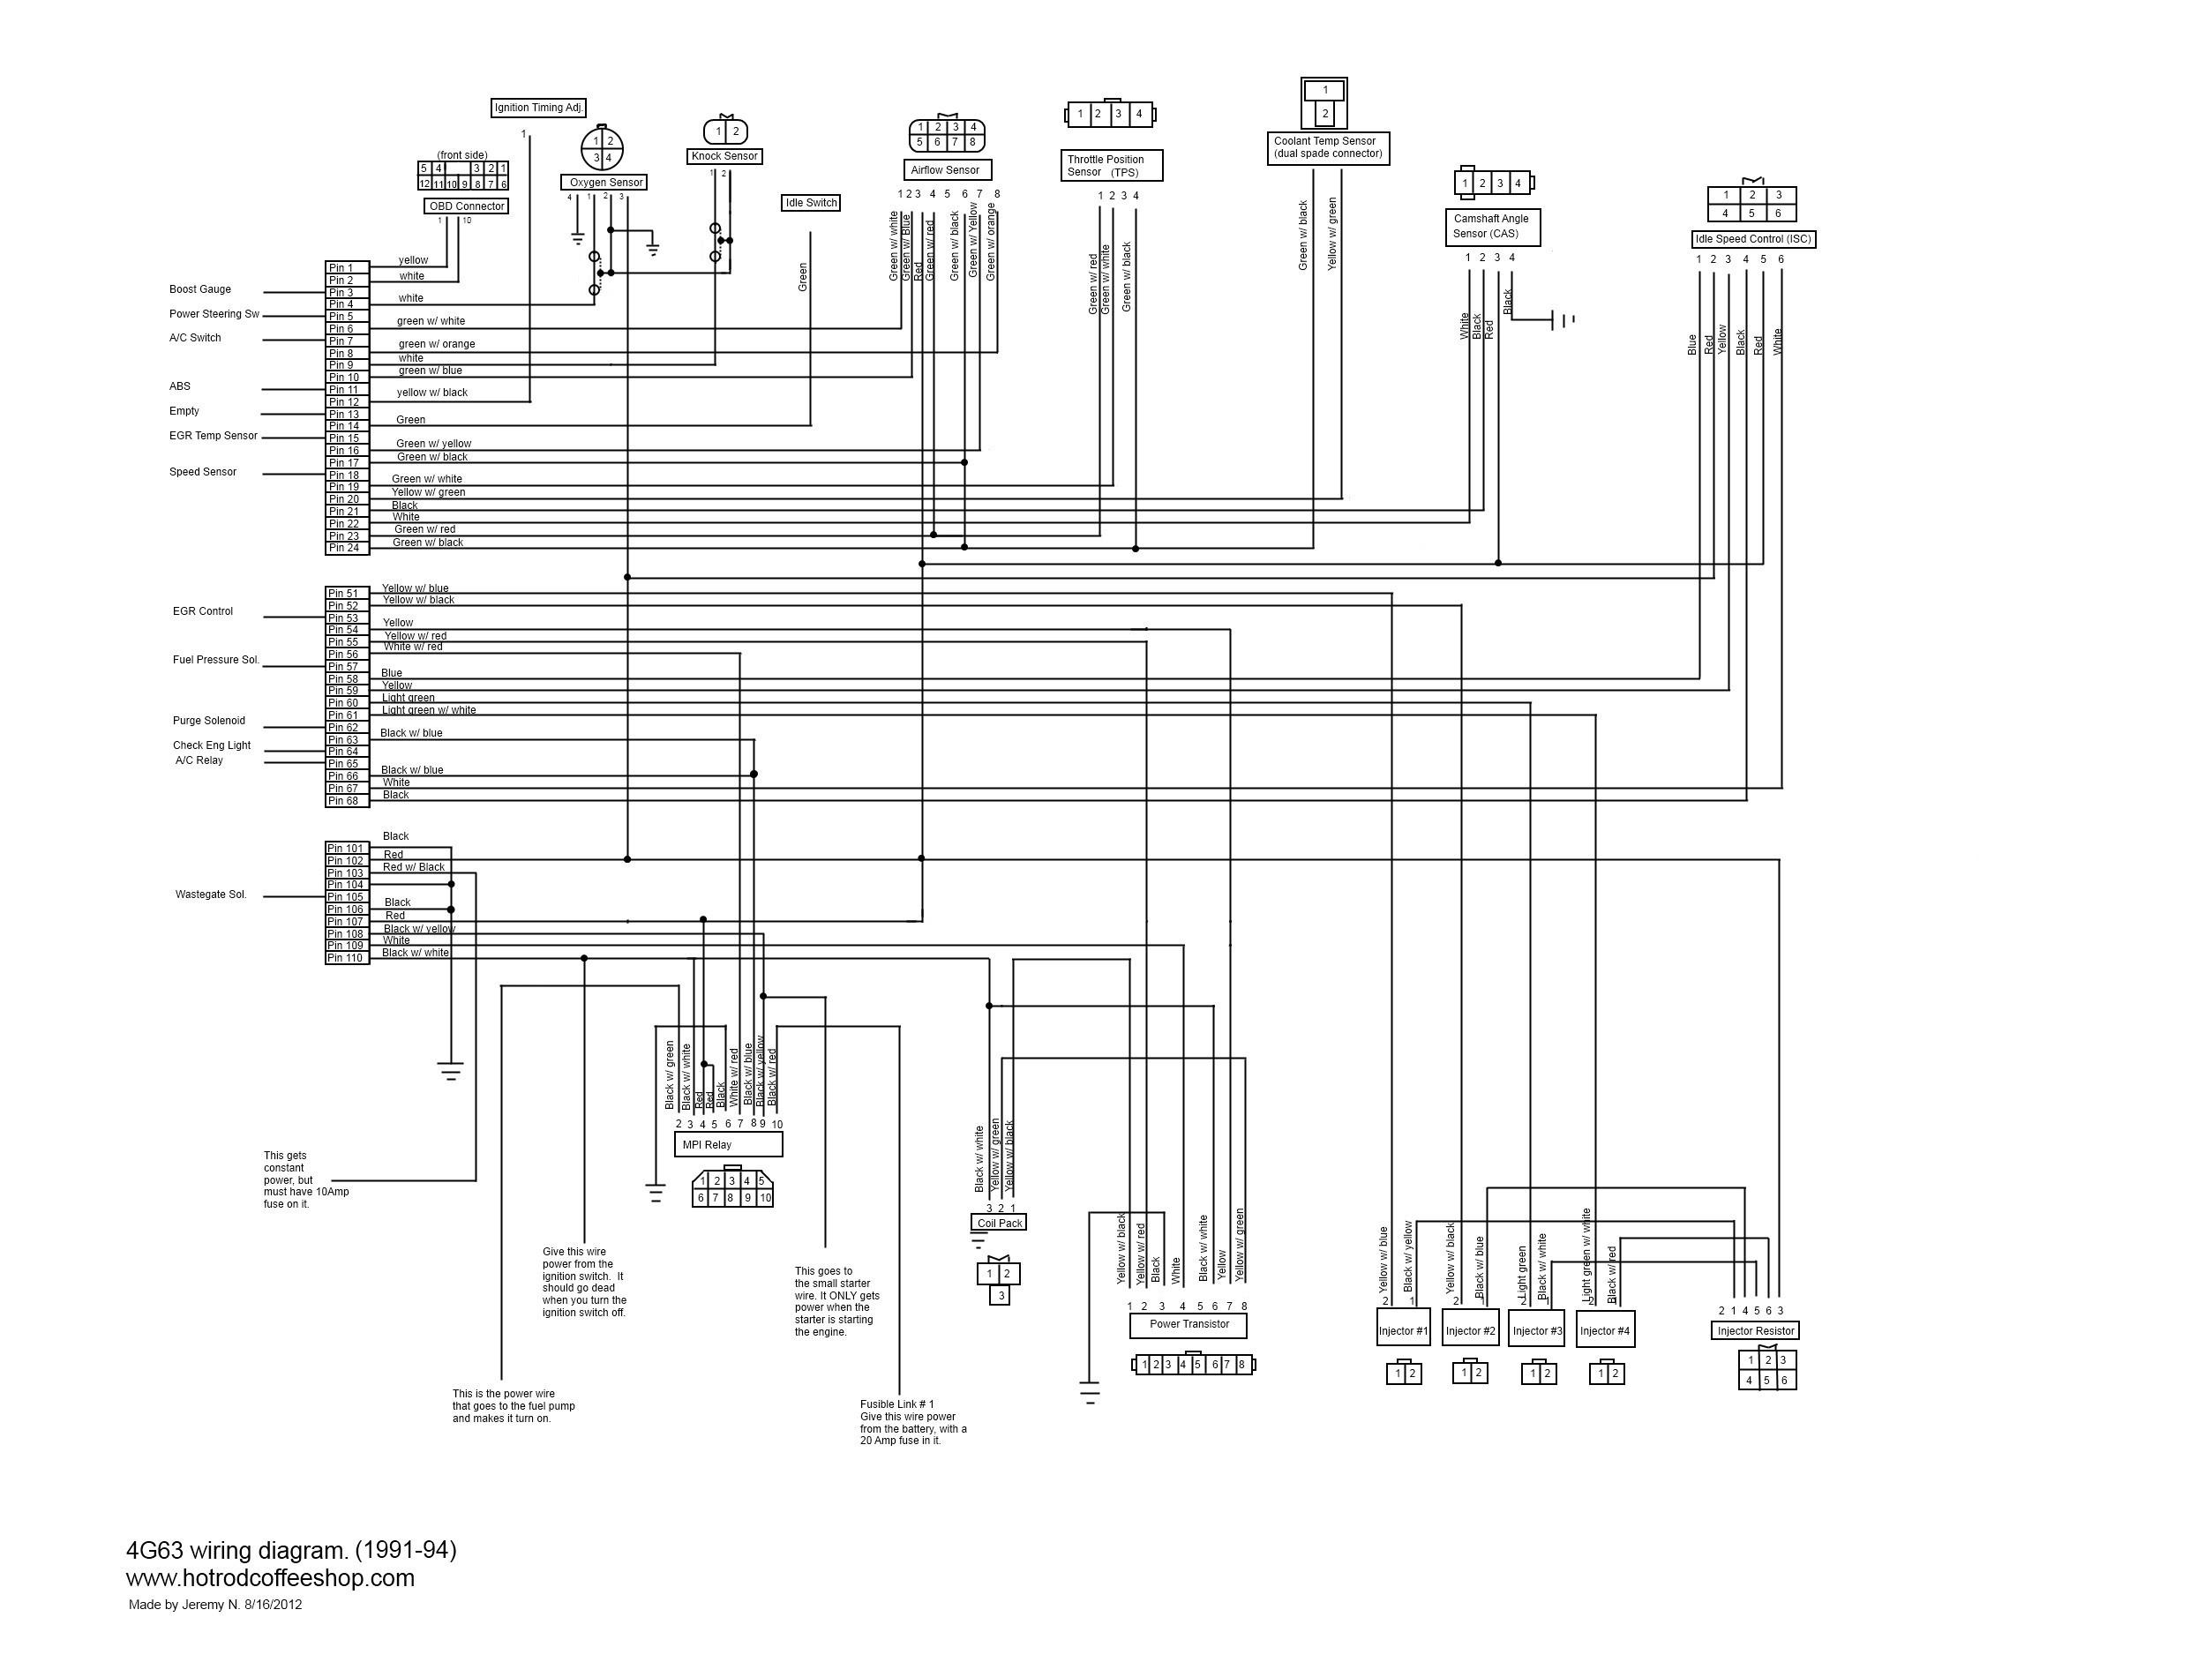 DIAGRAM] 2000 Mitsubishi Galant Ignition Wiring Diagram FULL Version HD  Quality Wiring Diagram - DVMFACEBOOK.CLUB-RONSARD.FR Club Ronsard